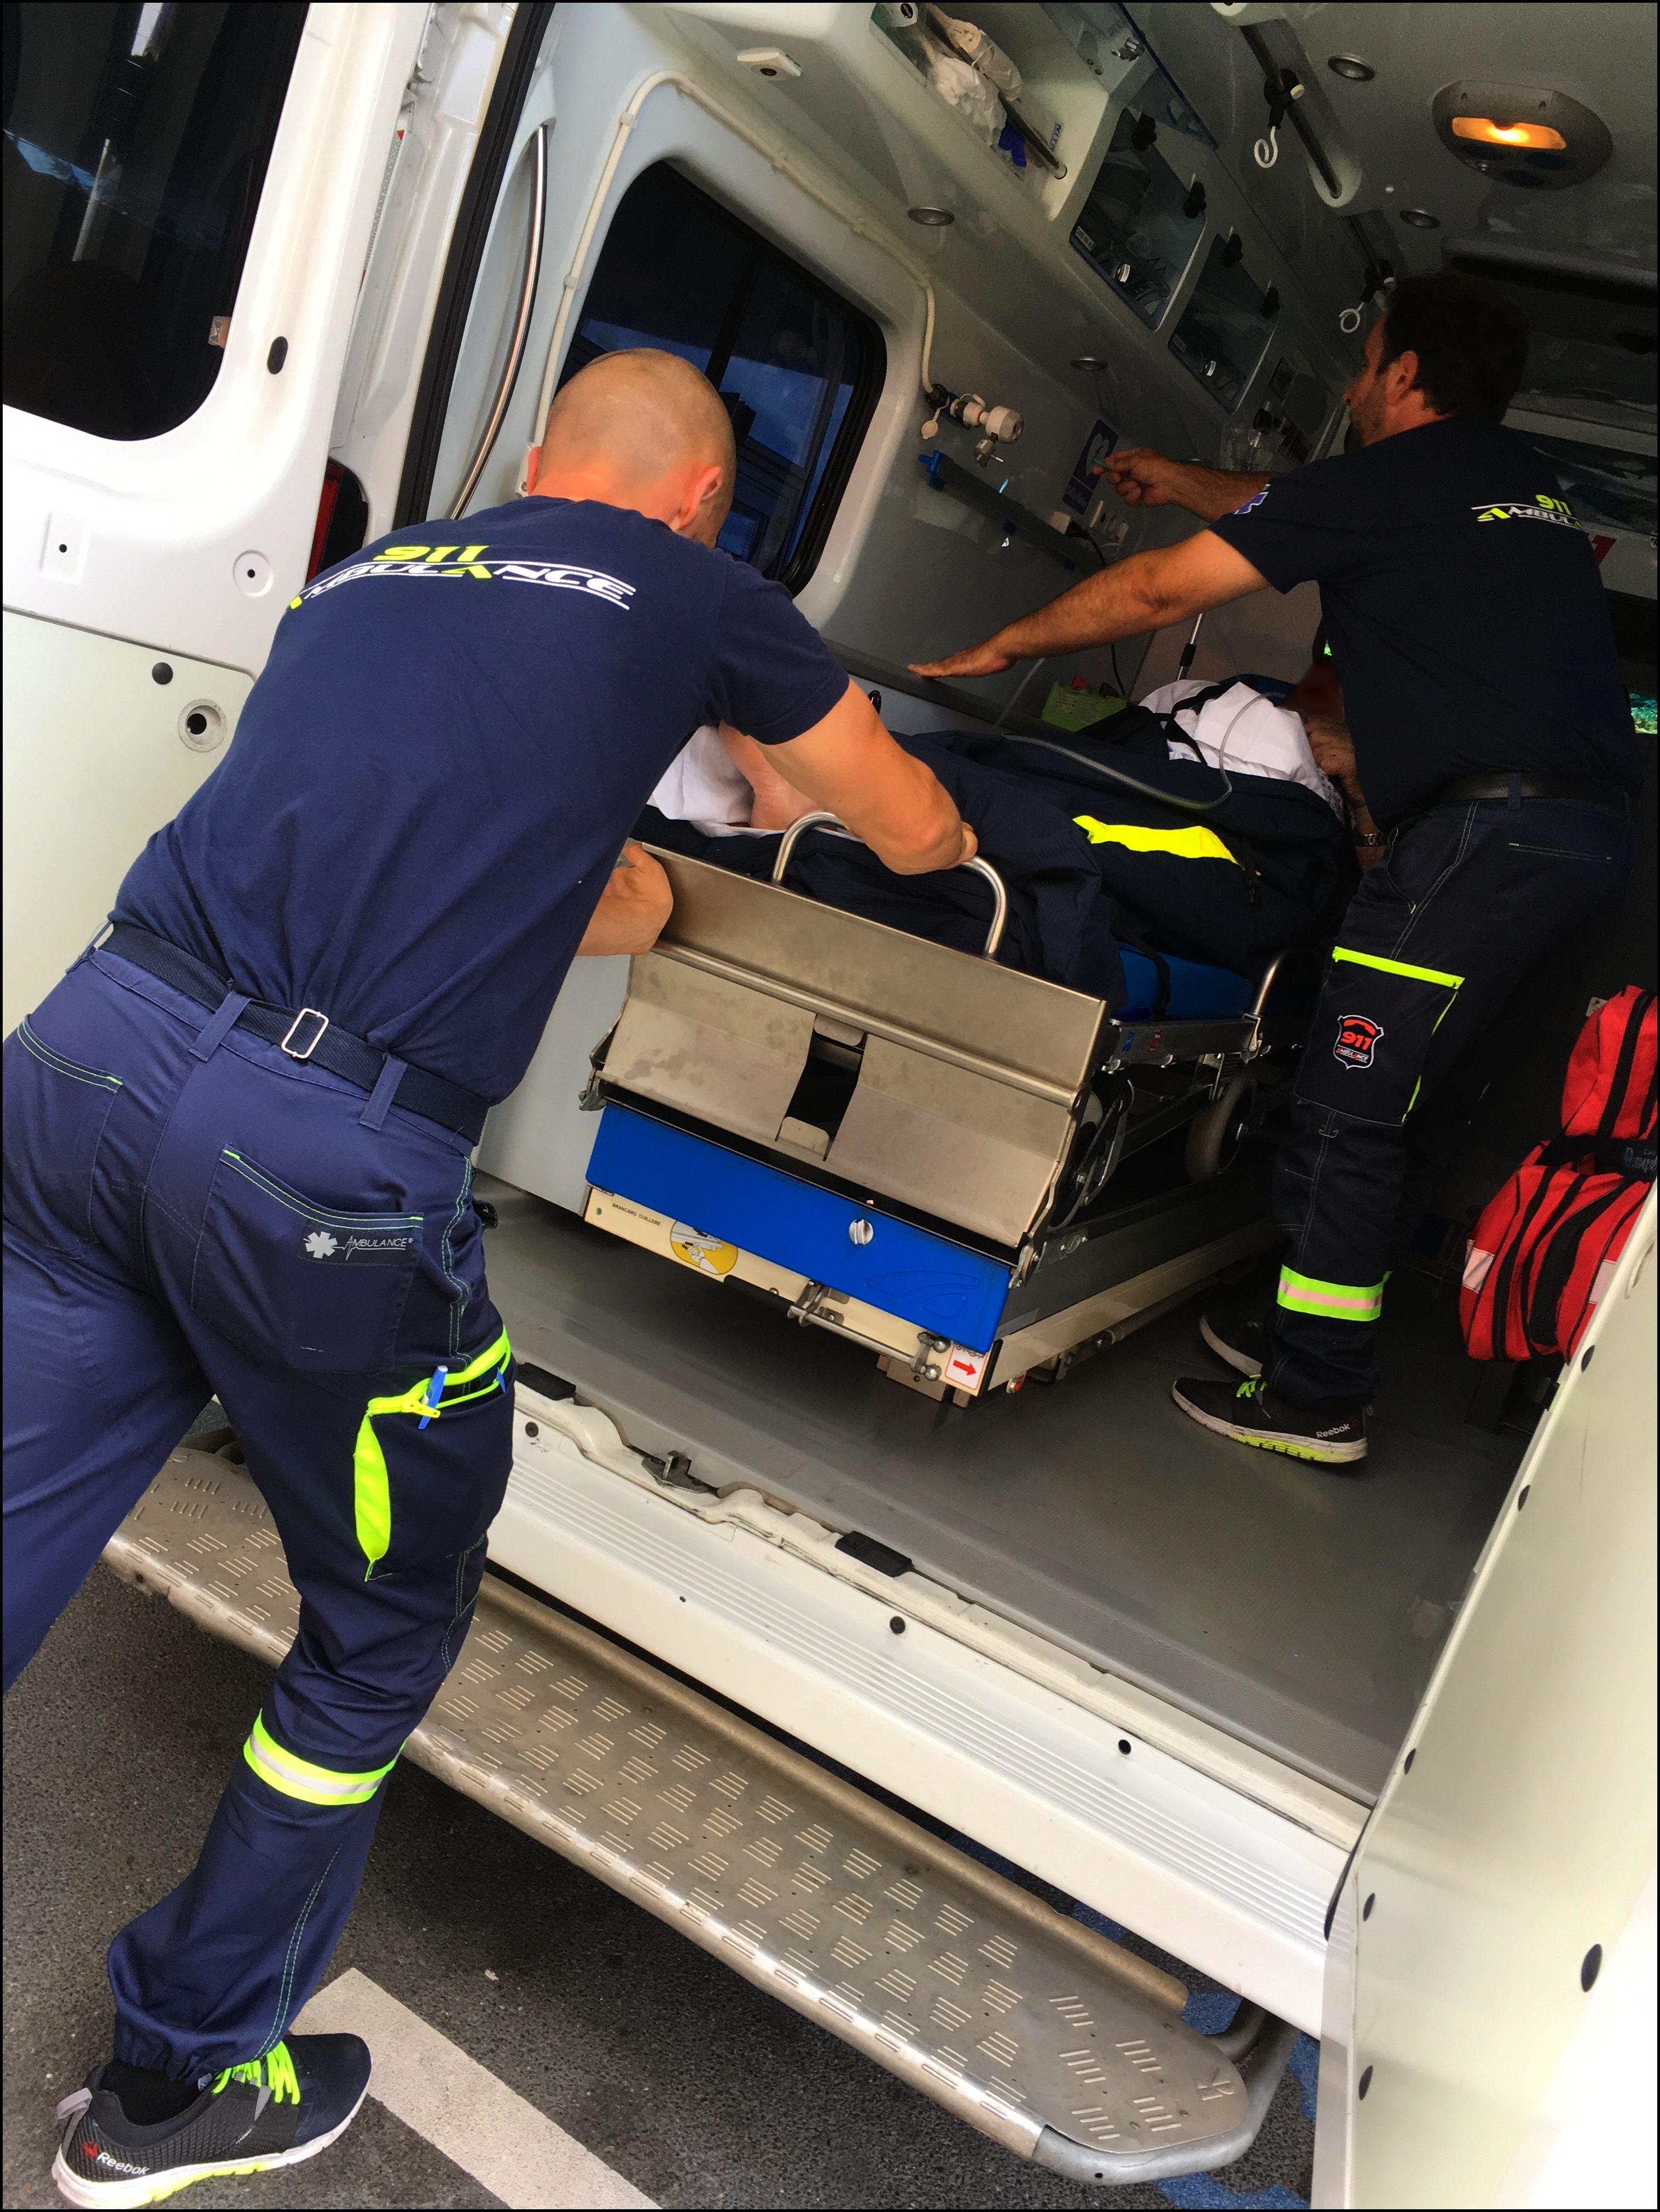 recrutement  u00bb 911 ambulance